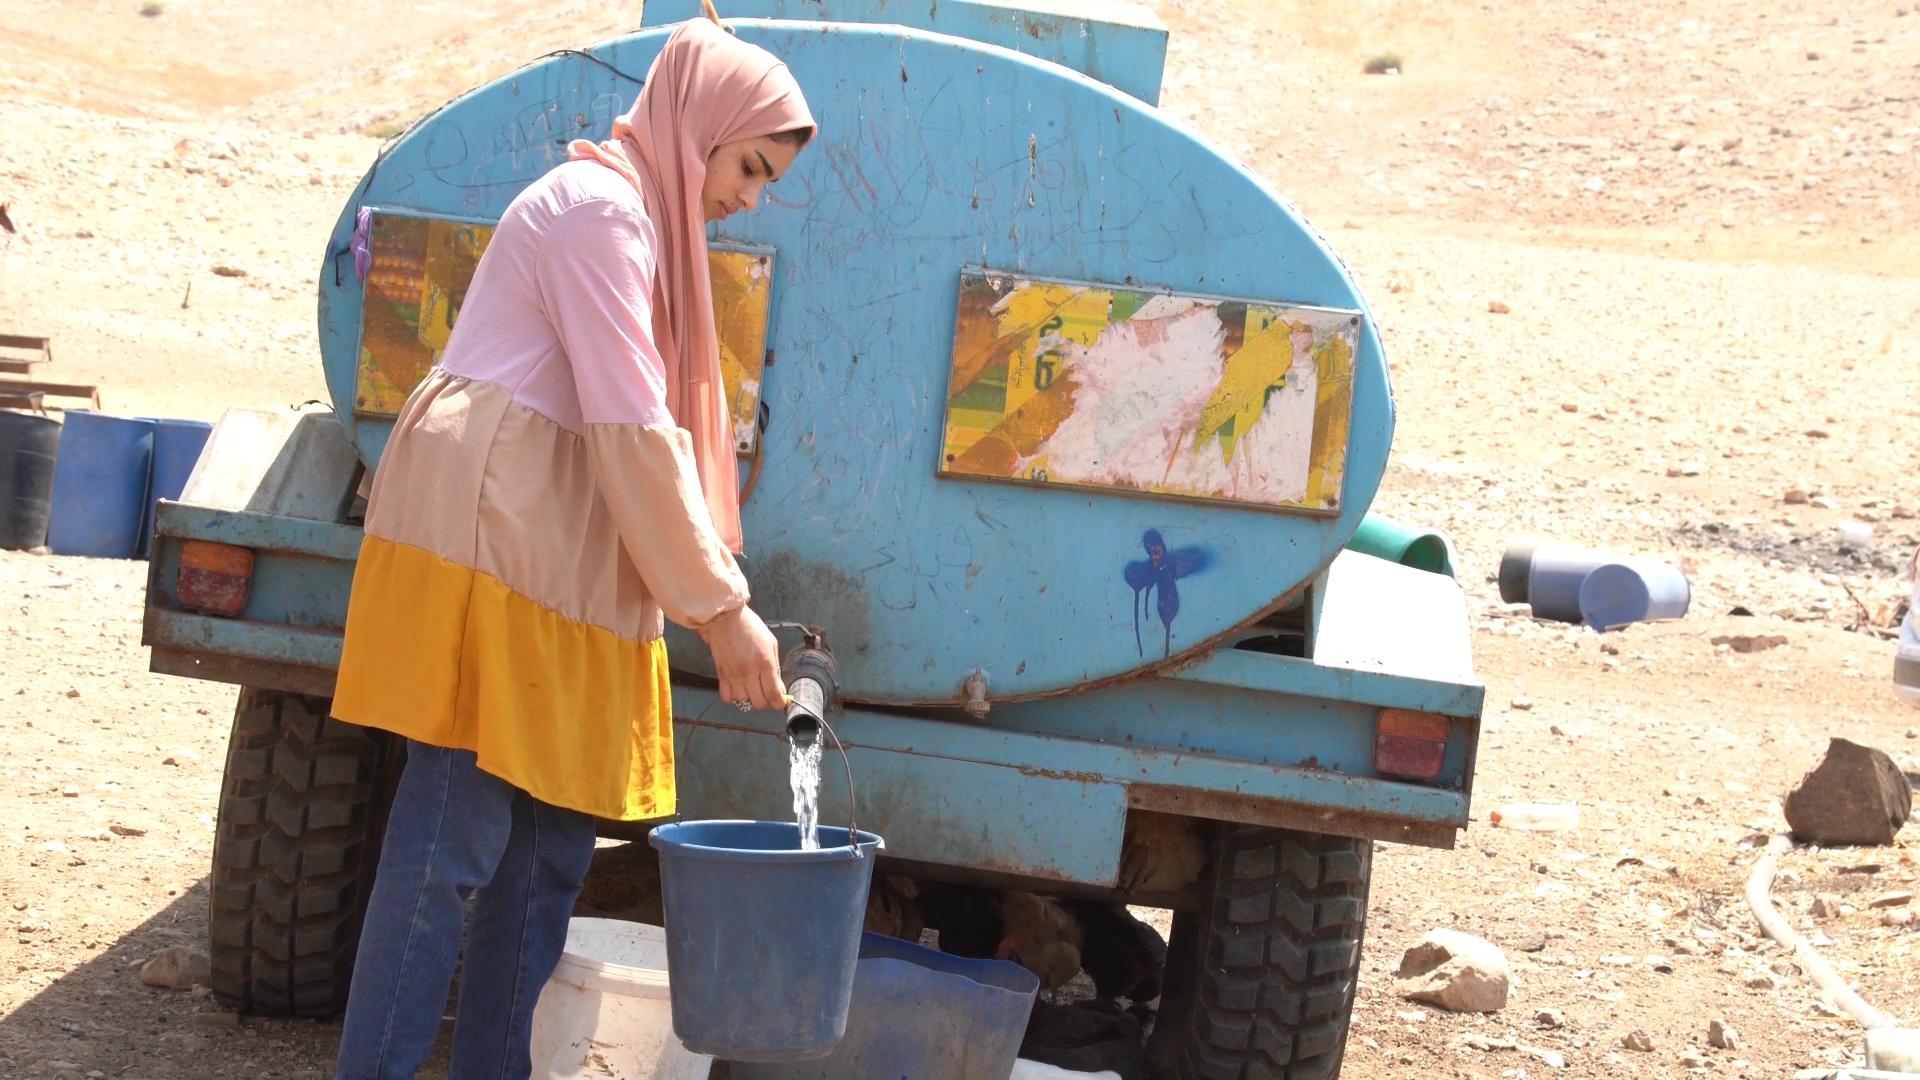 Deposito de agua para la poblacion beduina en Cisjordania.